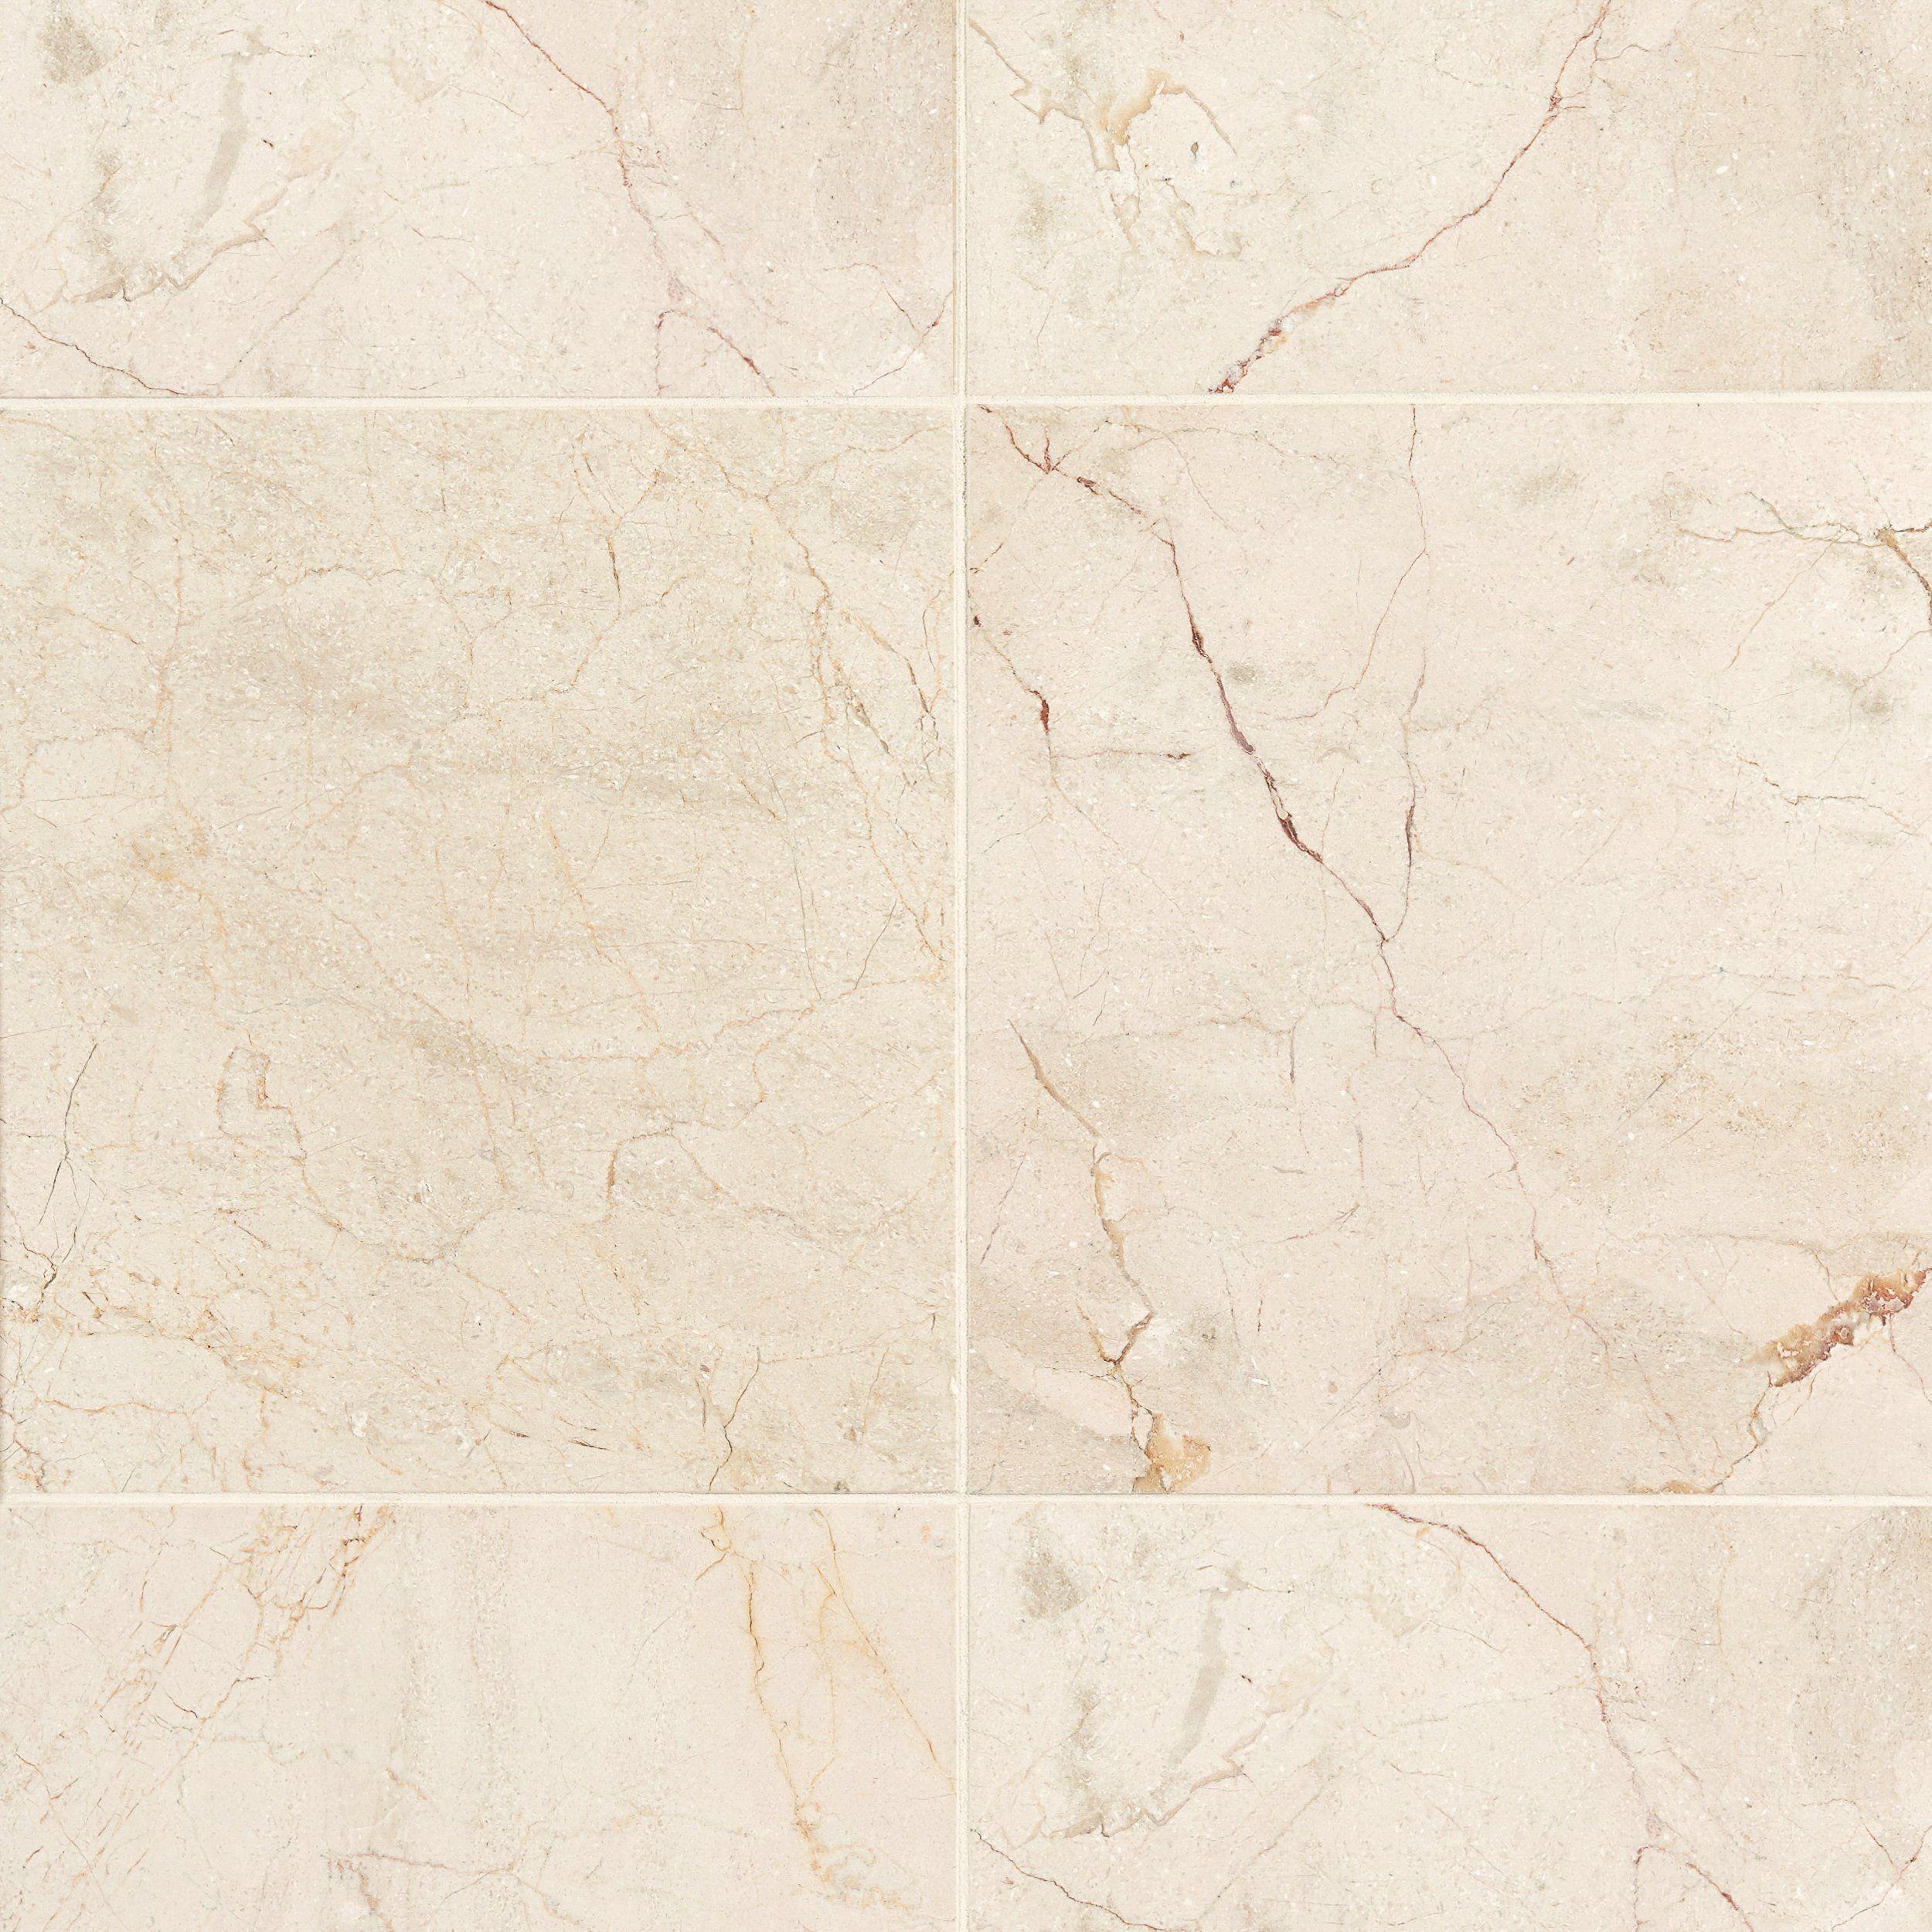 Crema Marfil Marble Tile Crema Marfil Marble Floor Decor Polished Marble Tiles Flooring Stone Wall Design